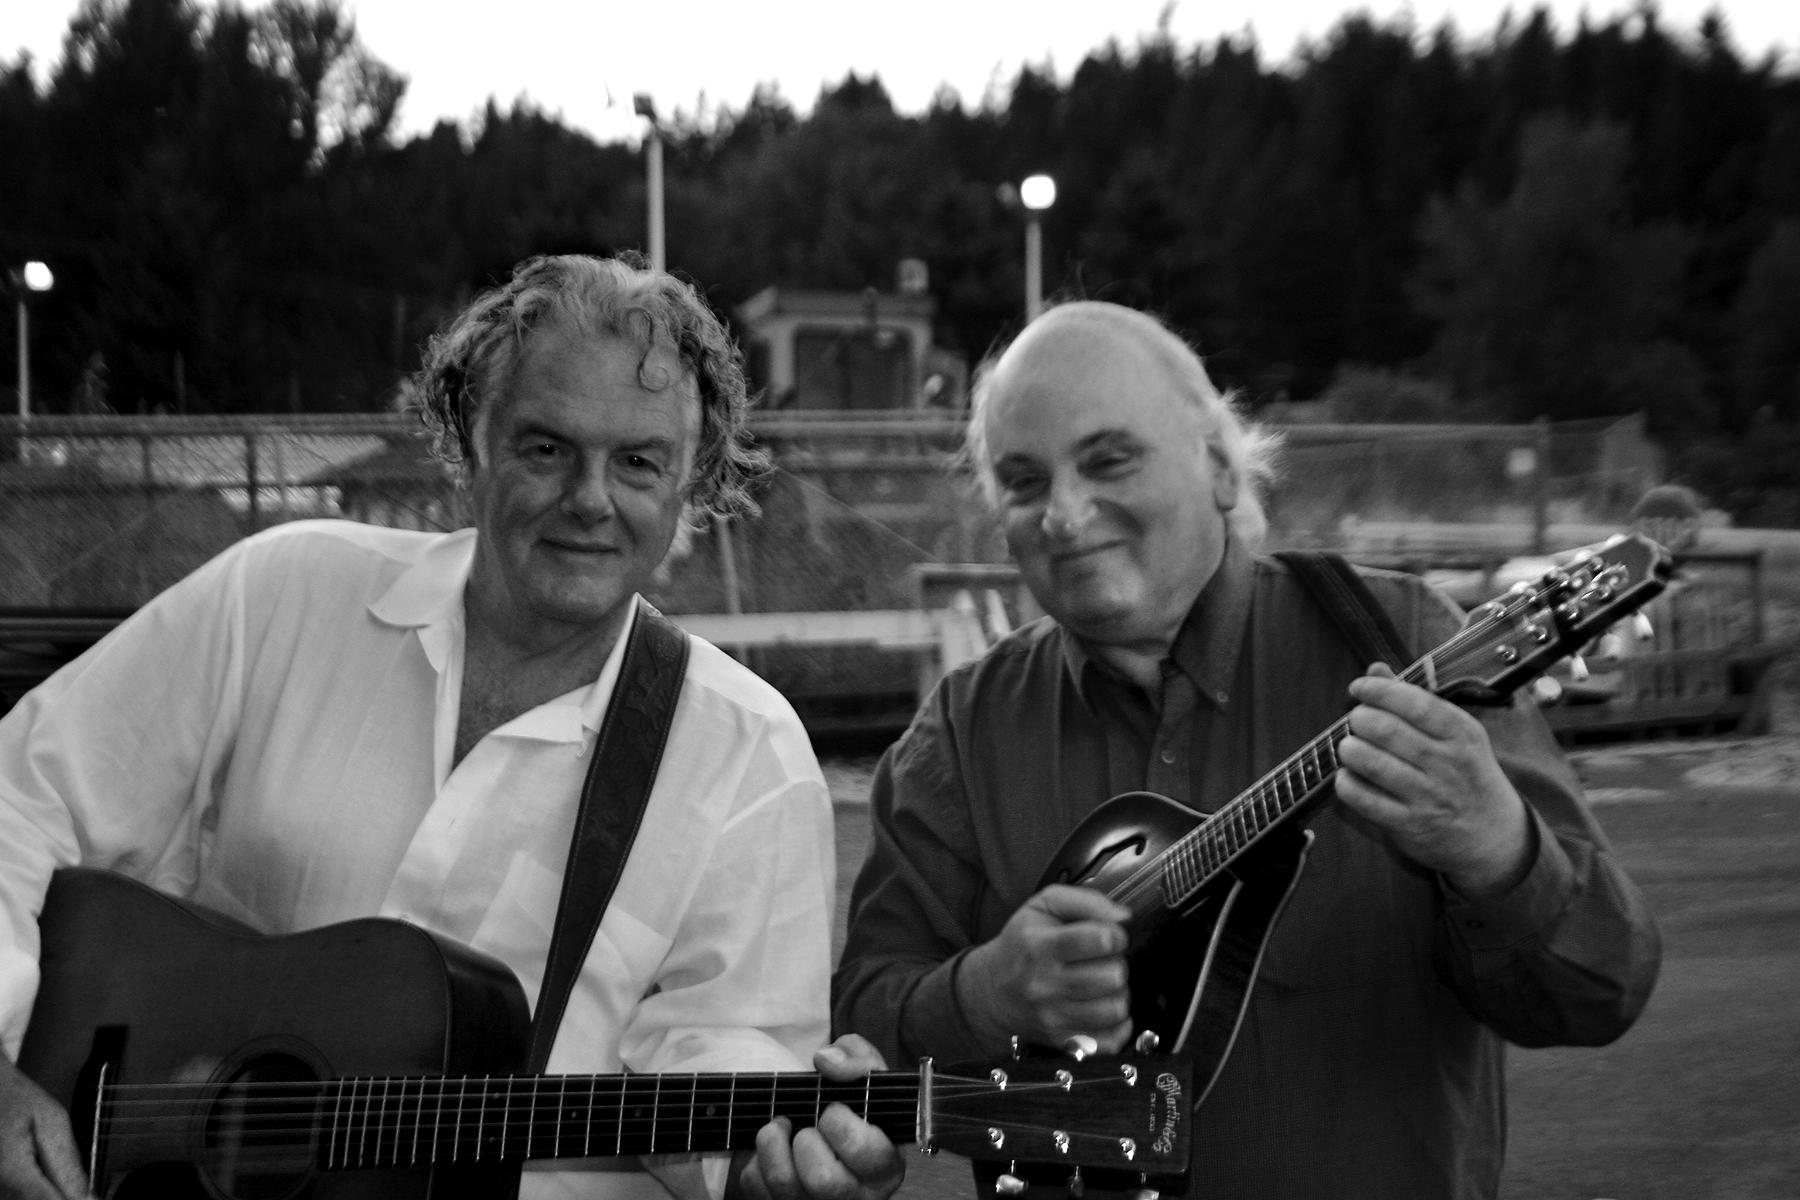 peter rowan and jody stecher. photo courtesy of jody stecher.